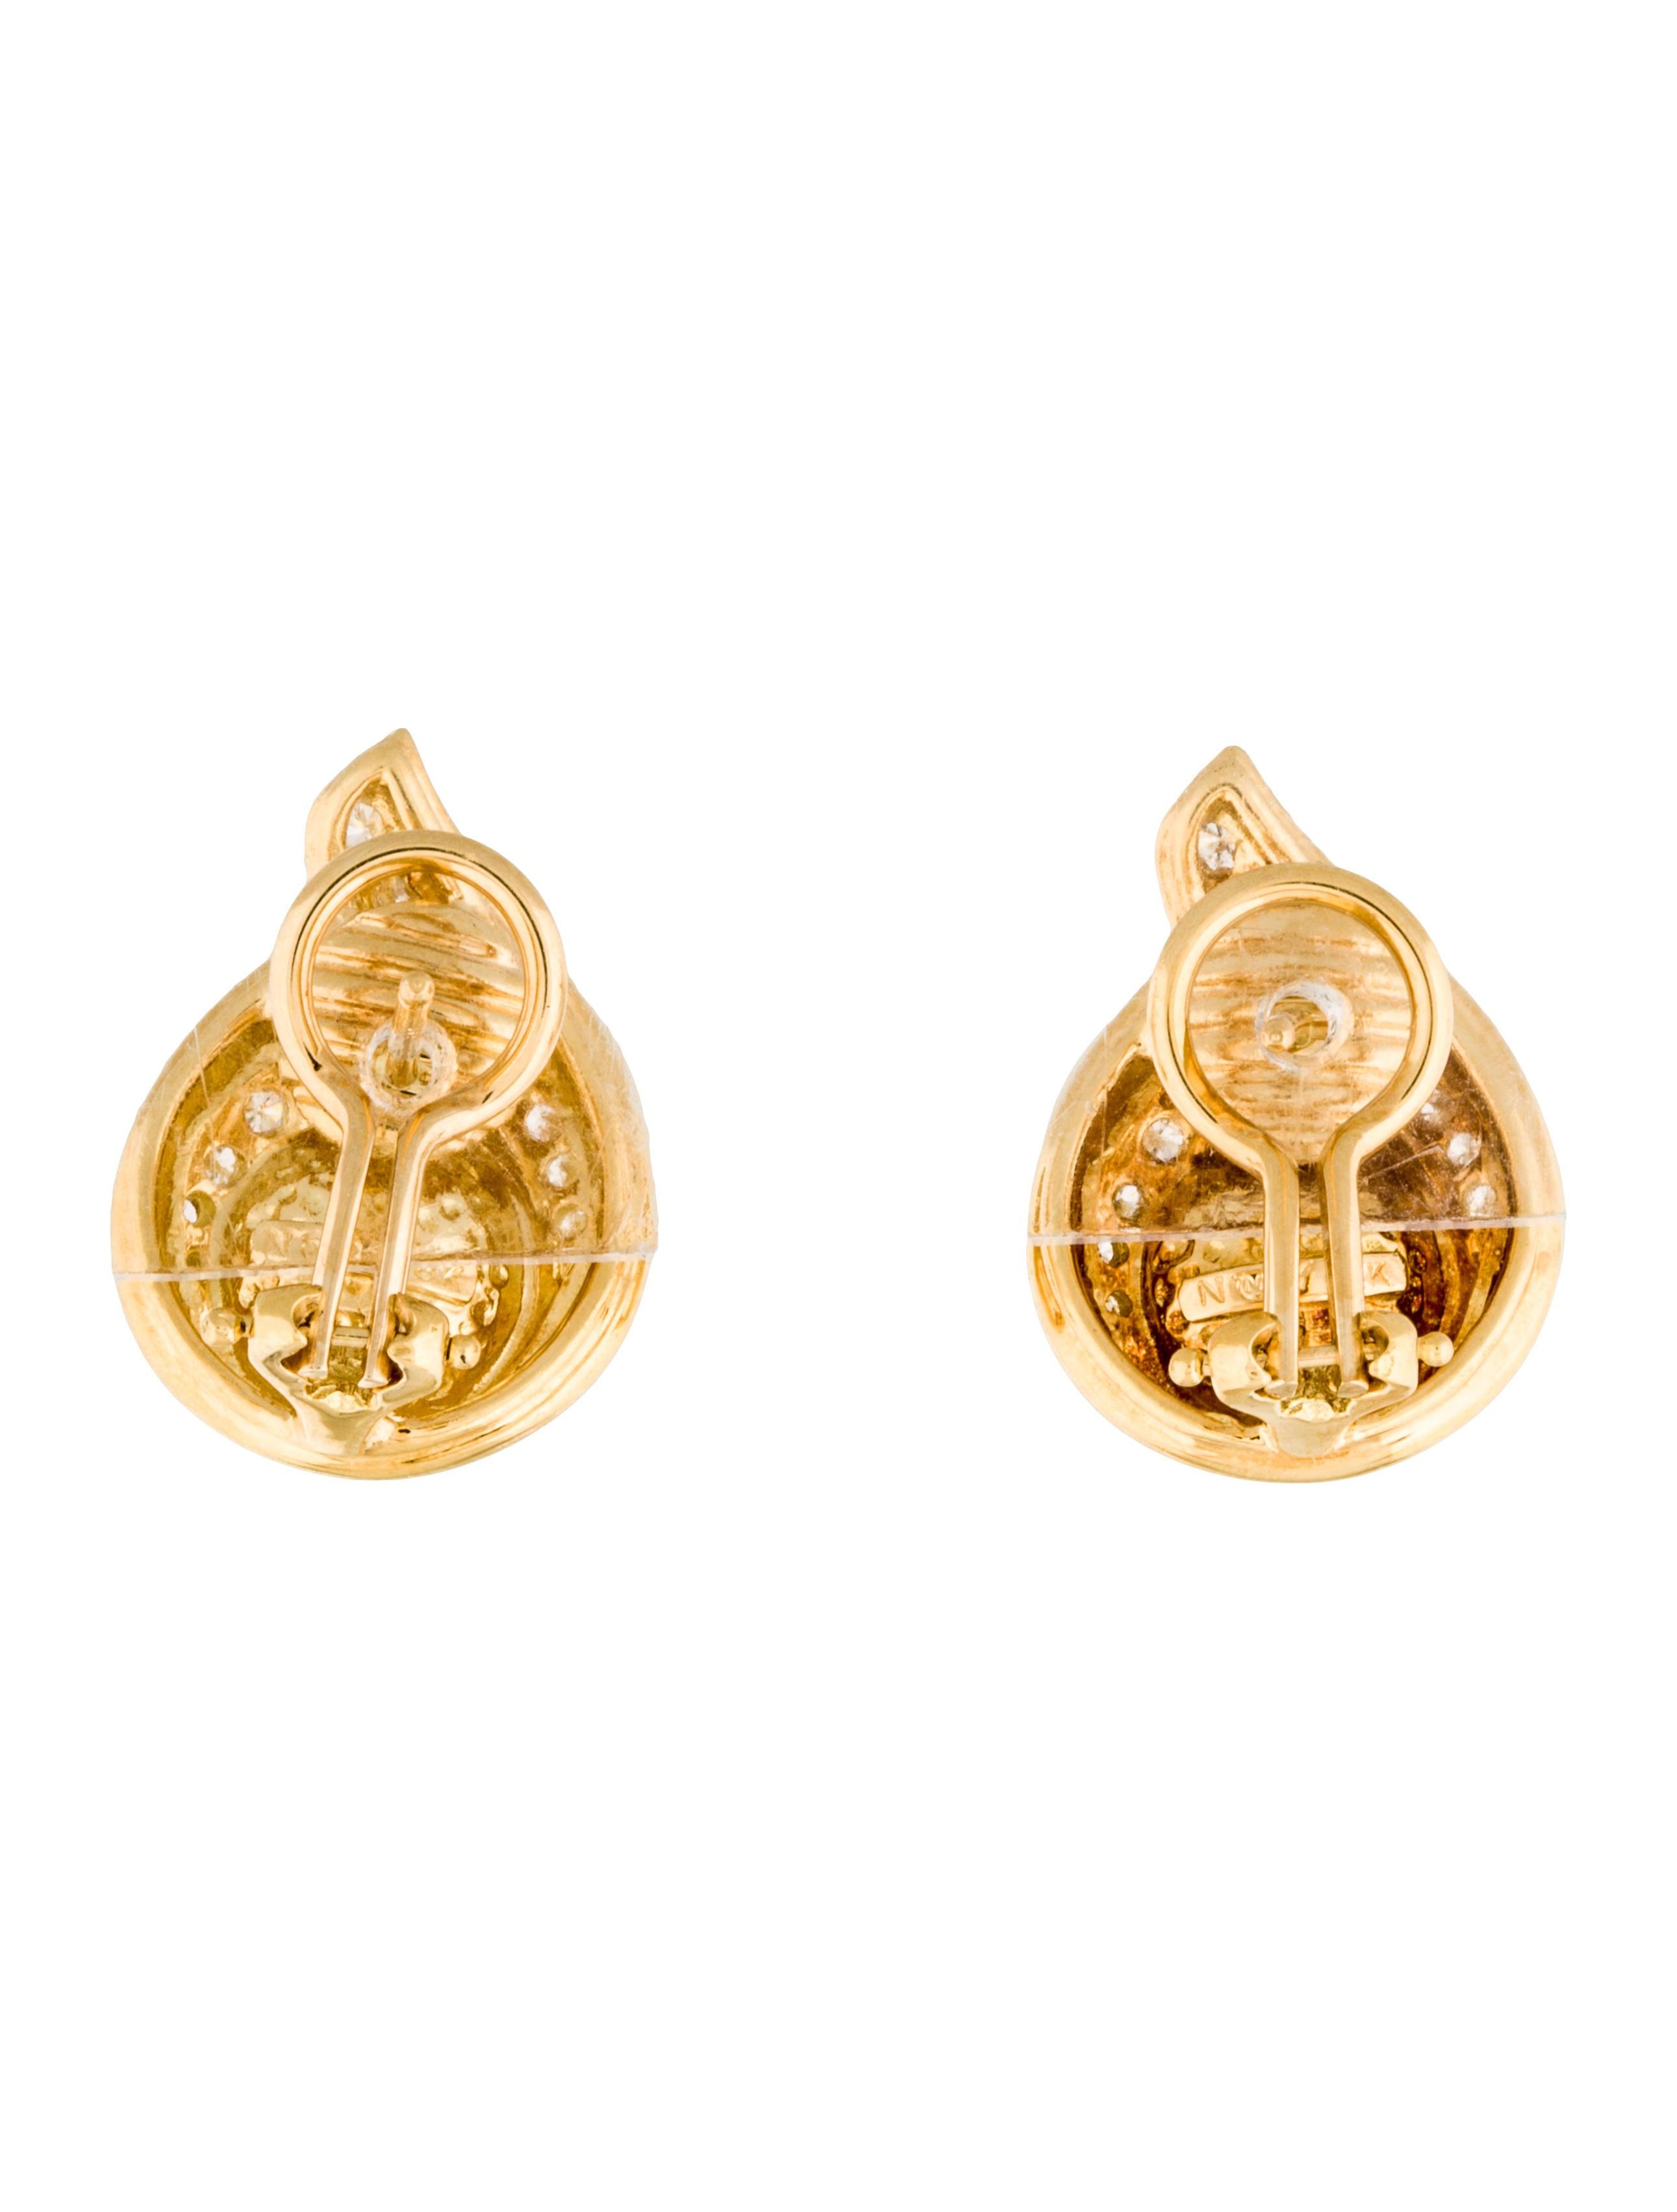 Mikimoto 18k Pearl & Diamond Earrings  Earrings. 50 Pesos Medallion. Kim Kardashian Medallion. Unique Gold Medallion. Head Medallion. 4402 8000 Medallion. Scorpio Medallion. Many Medal Medallion. Diploma Medallion